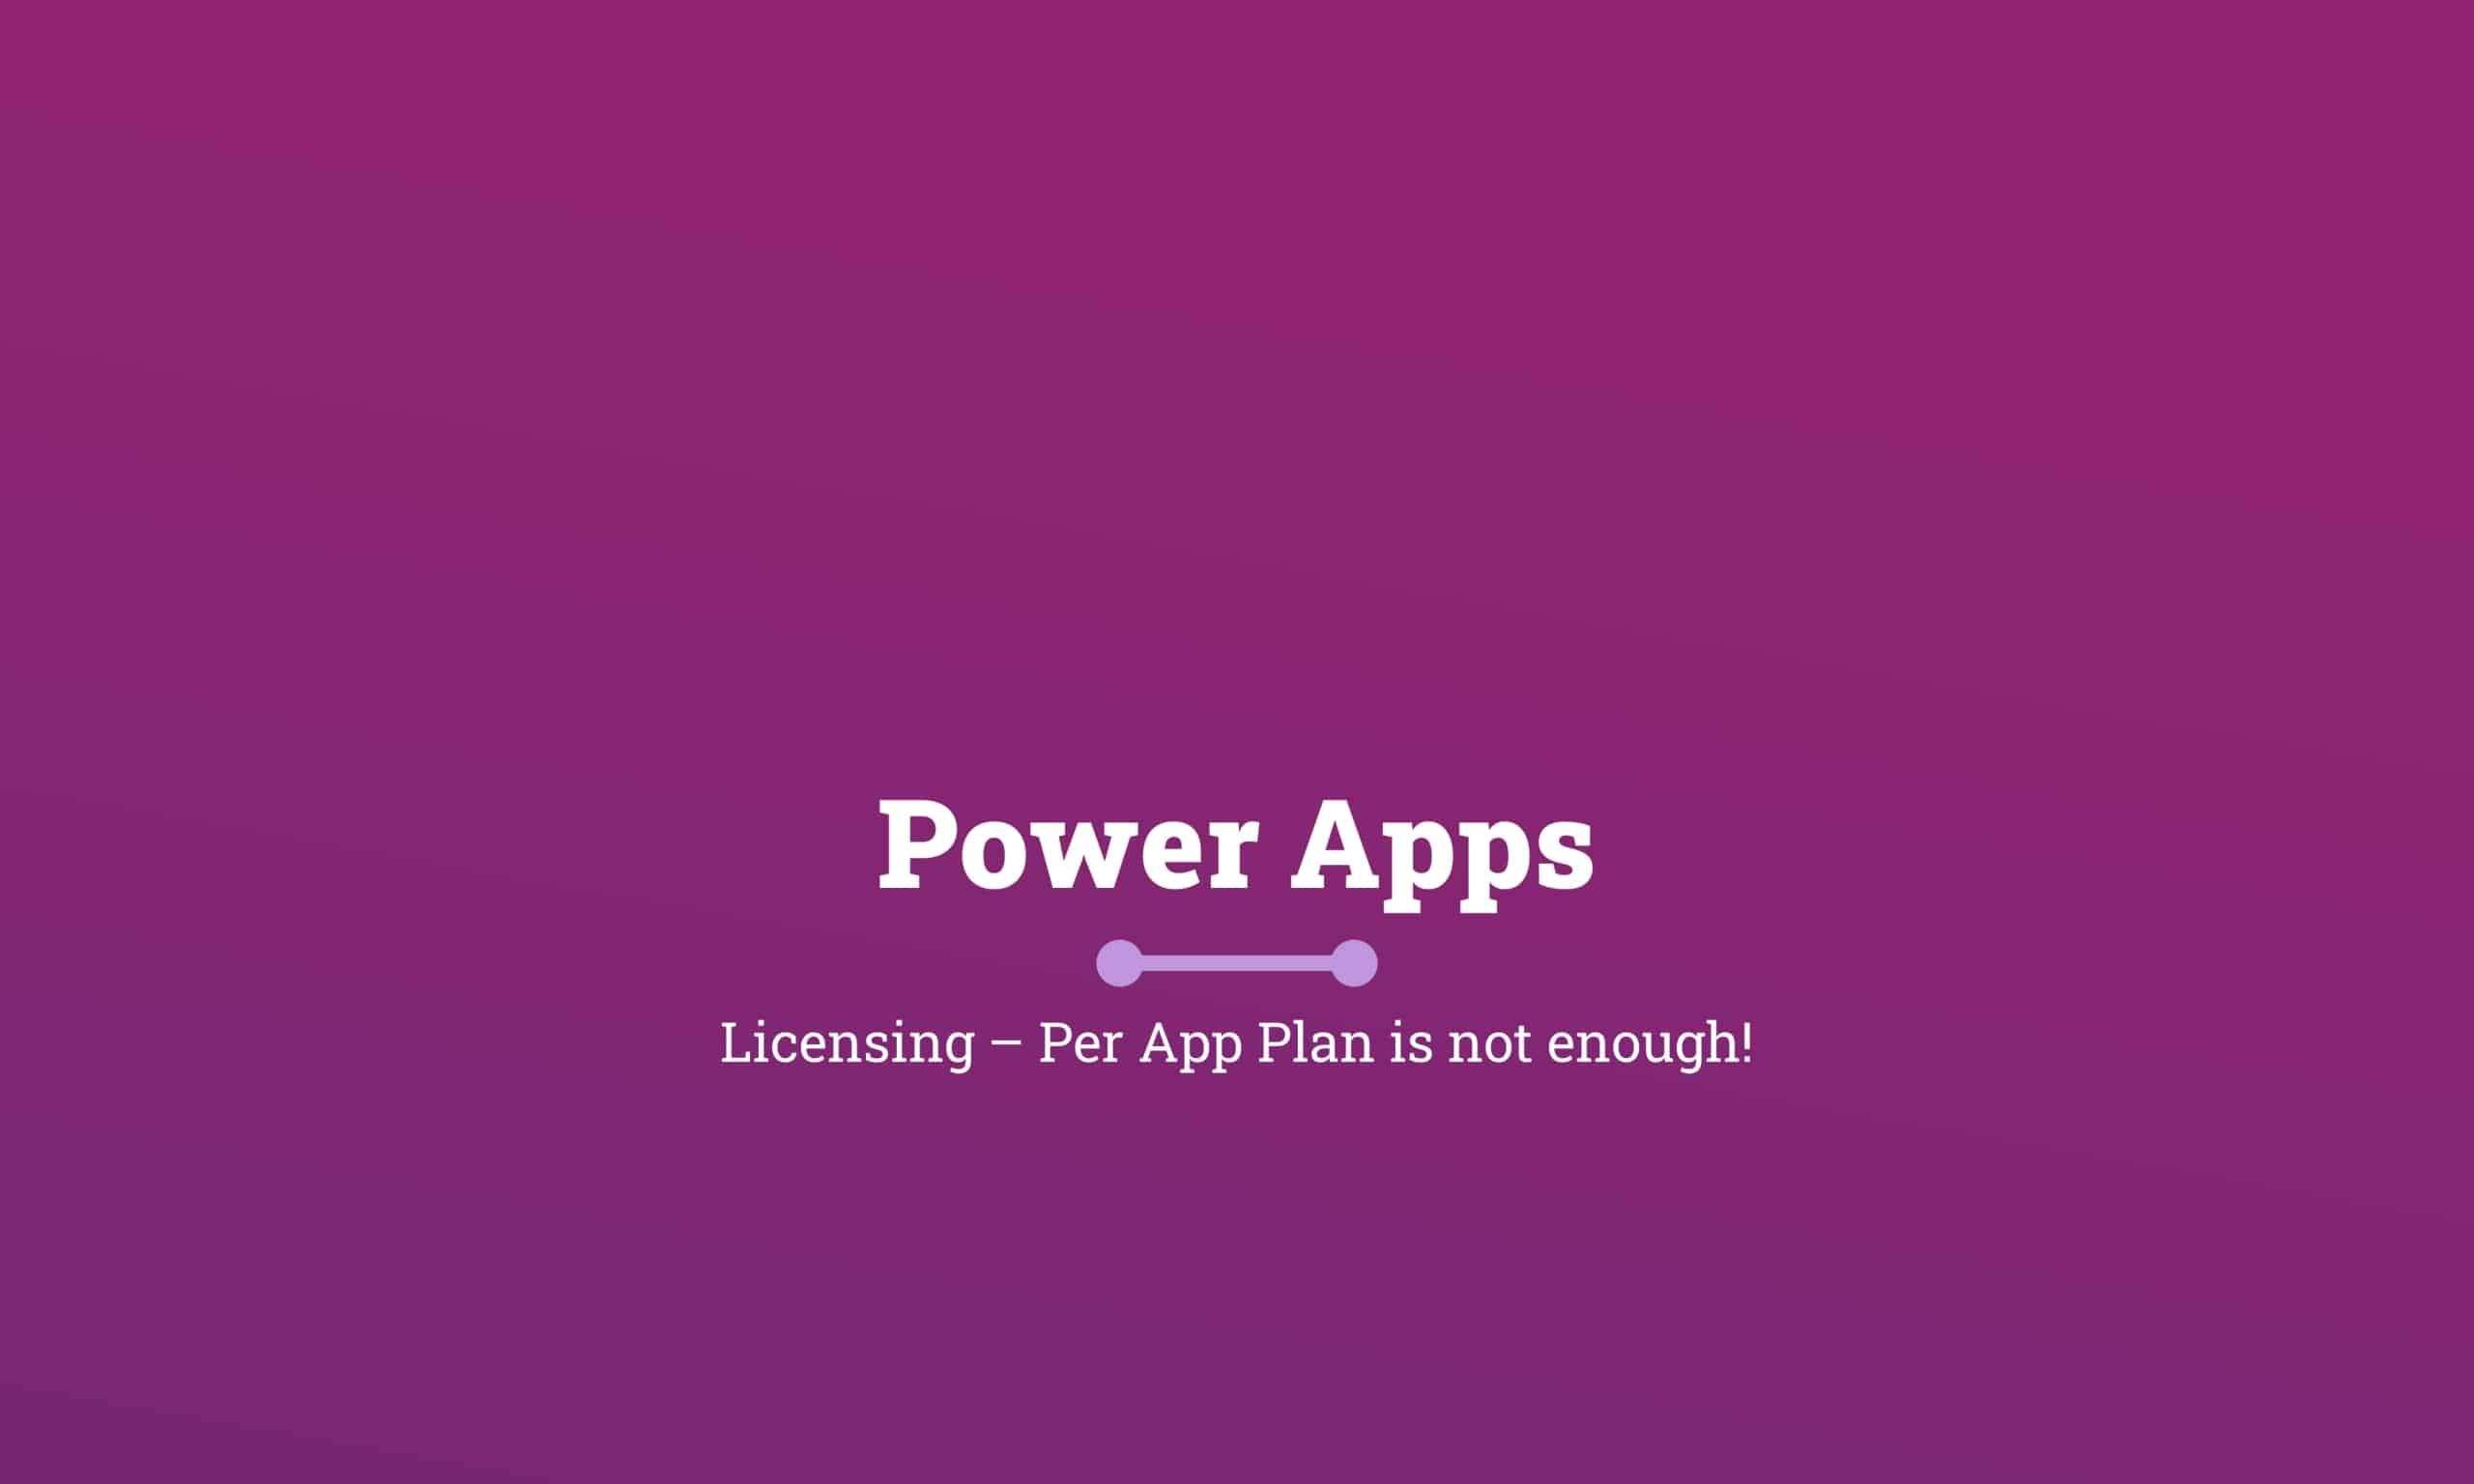 Microsoft PowerApps Per App Plan Not Enough Titelbild scaled